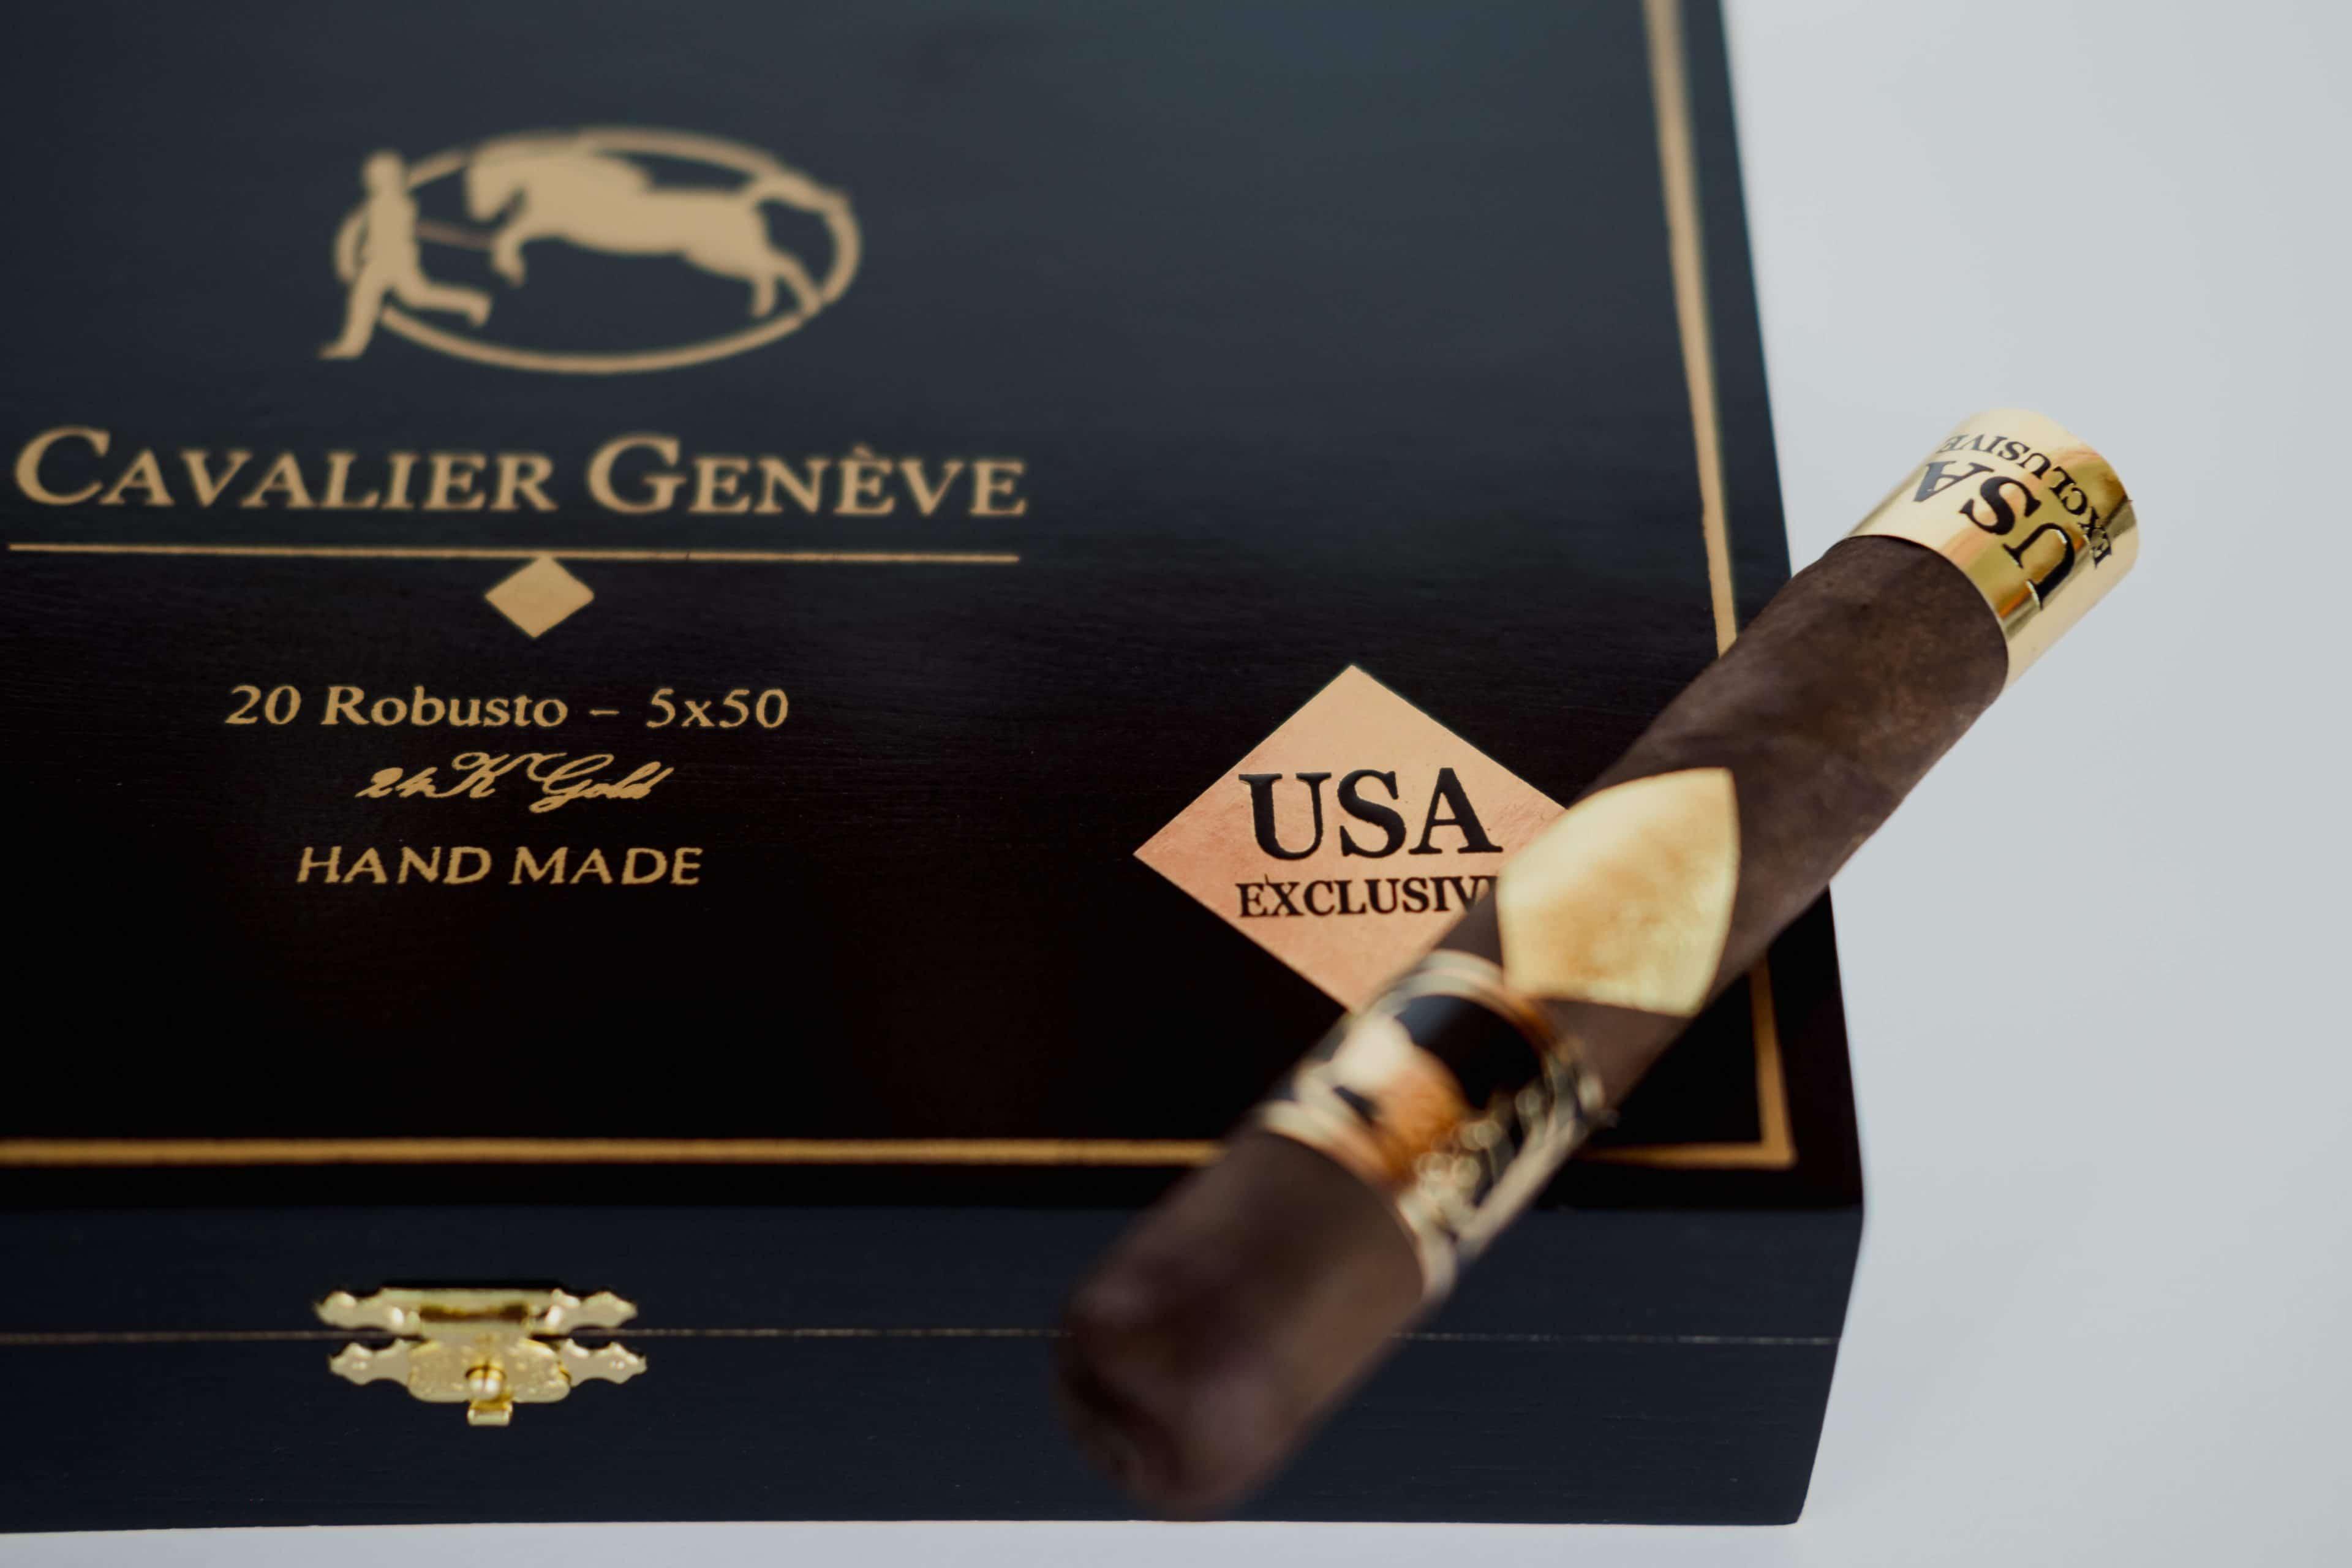 Cigar News: Cavalier Genève Updates Branding for Black Series USA Exclusive